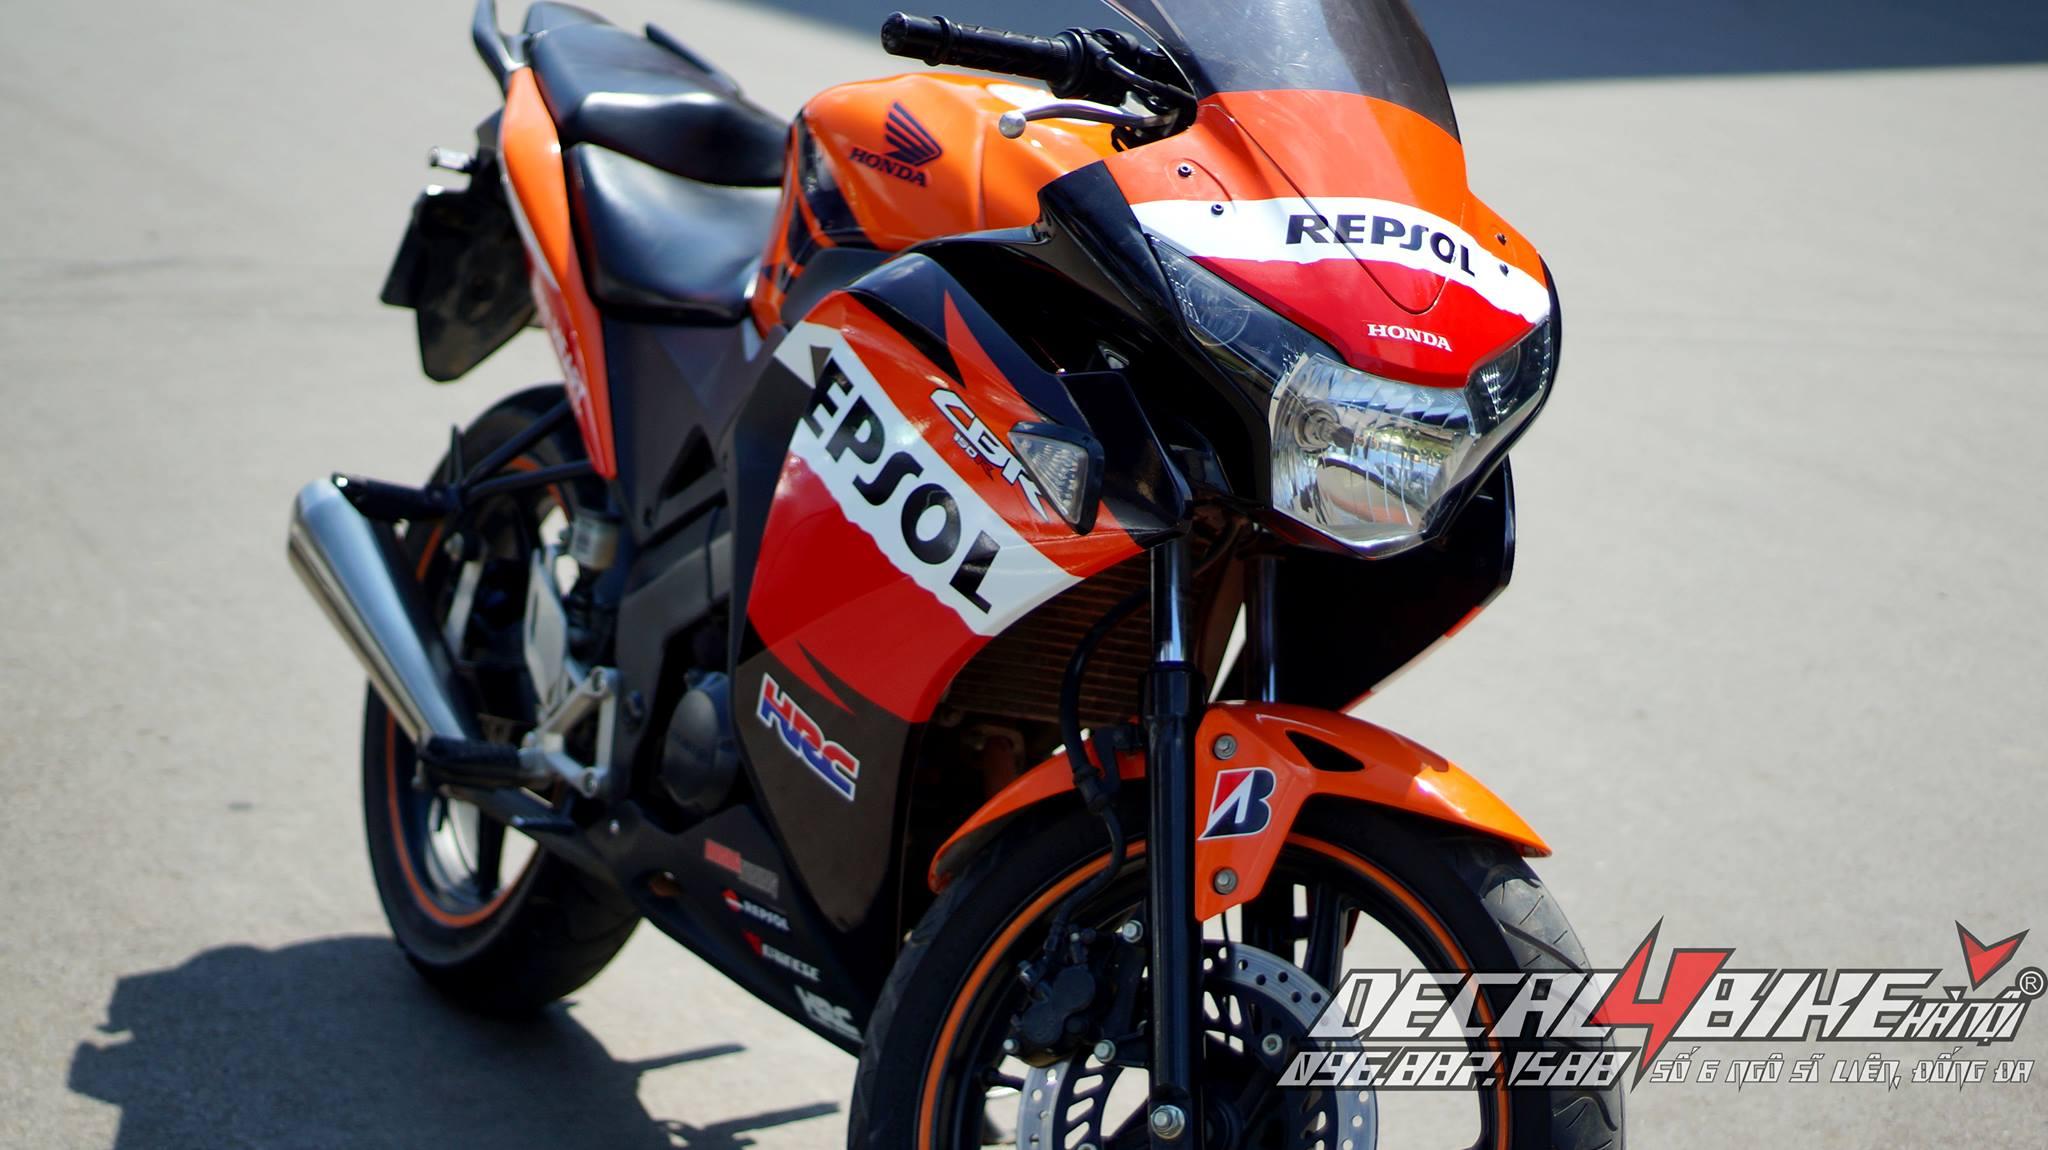 Cbr 150 Repsol Decal4bike Center 150cc Repsoledition